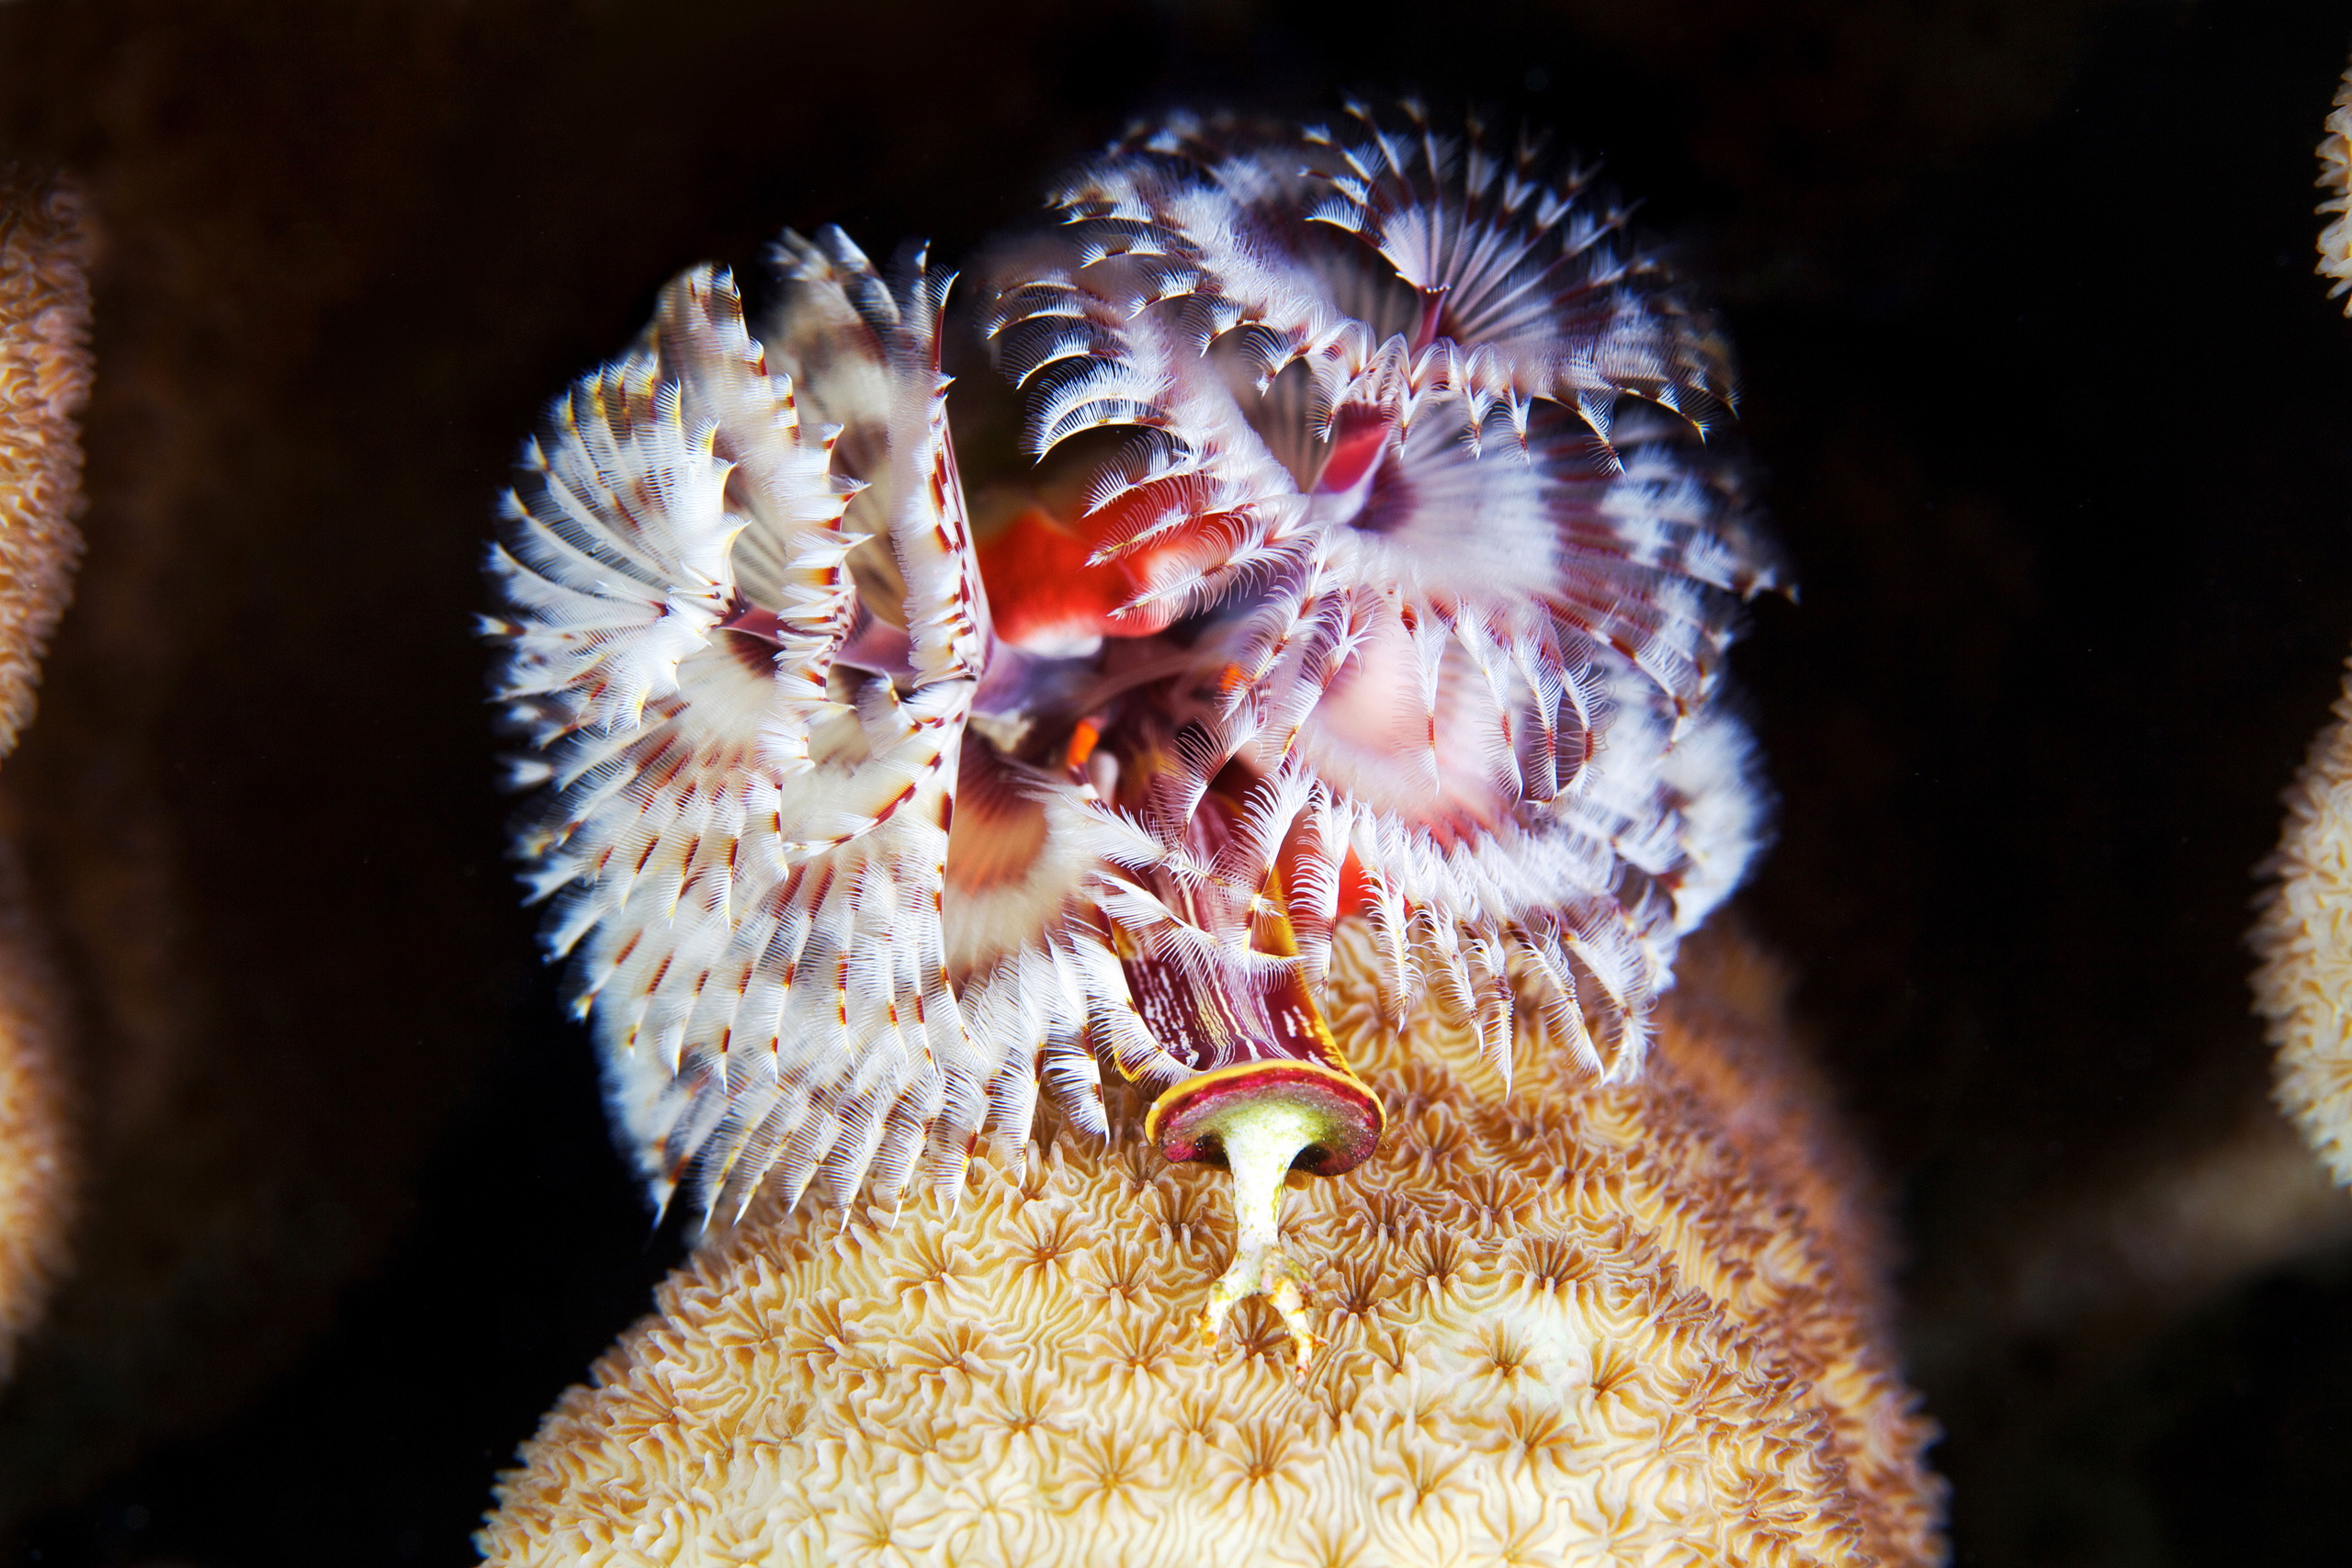 Polychaete – Spirobranchus giganteus